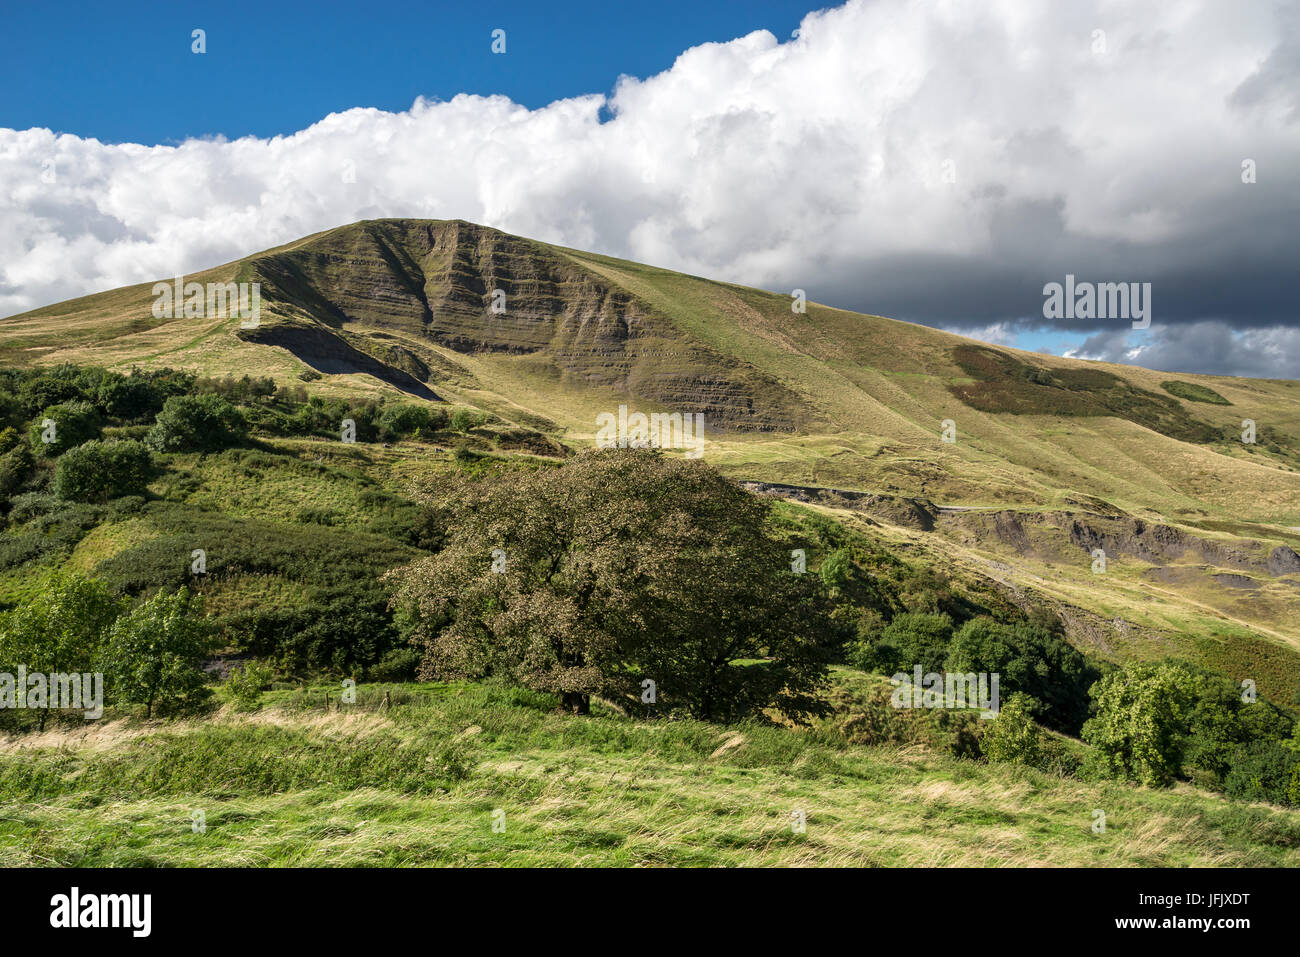 Mam Tor near Castleton in the Peak District national park, Derbyshire, England. - Stock Image